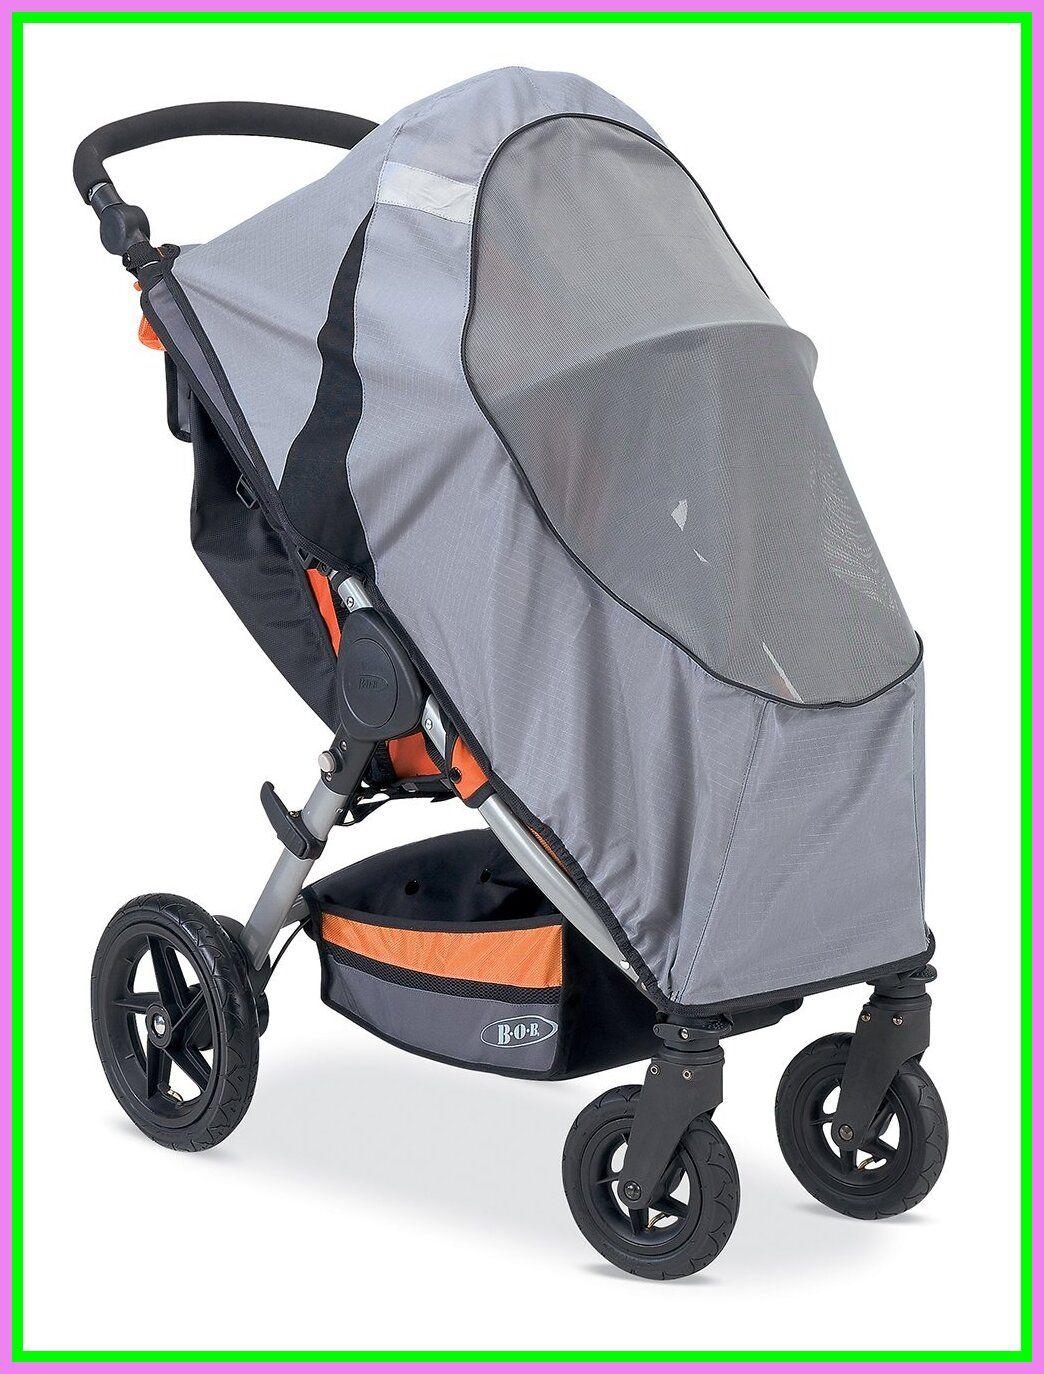 45++ Bob running stroller accessories ideas in 2021